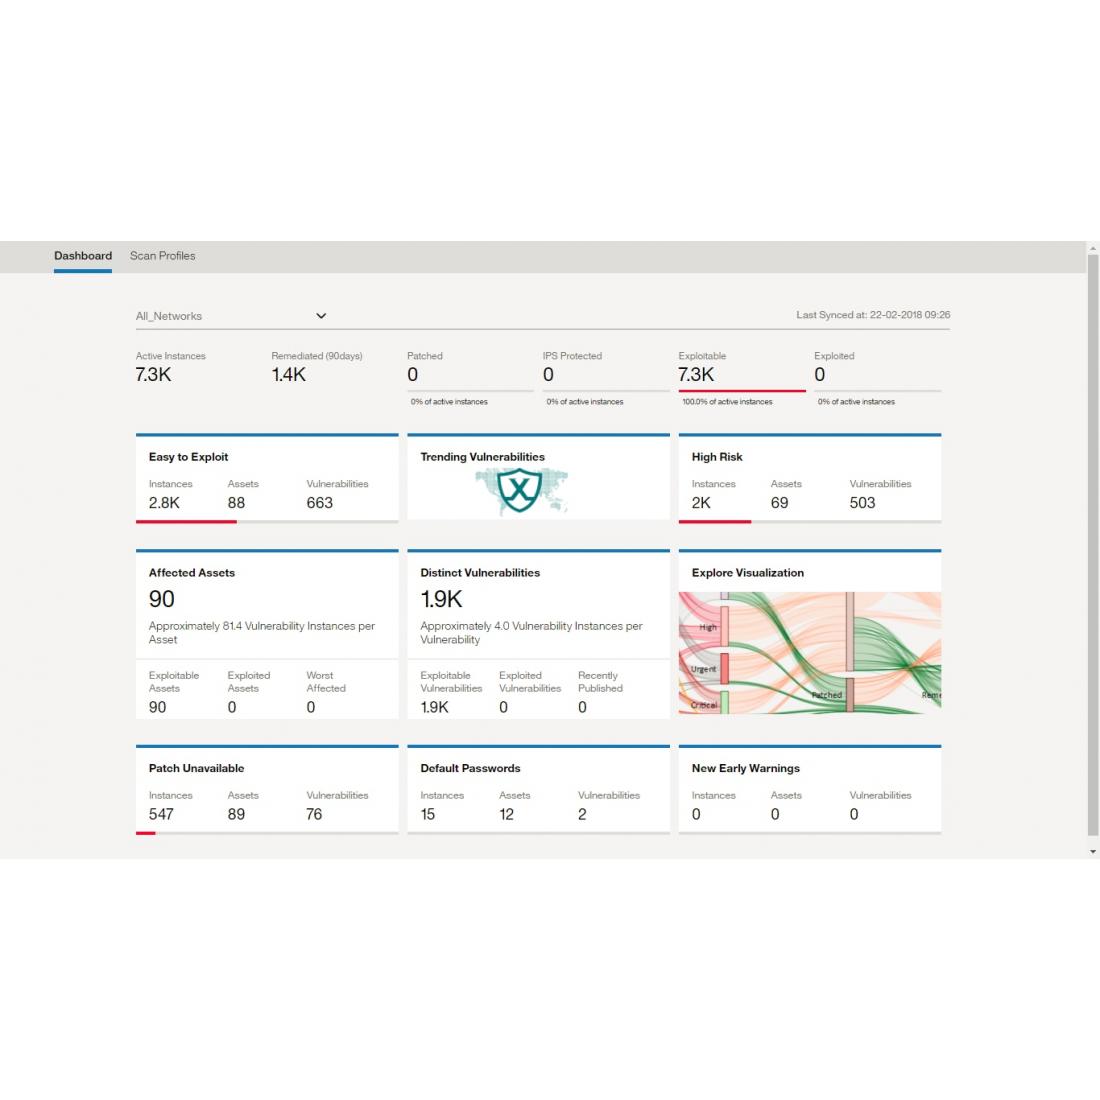 SIEM Security | QRadar Appliance 3148 | AI Security Automation